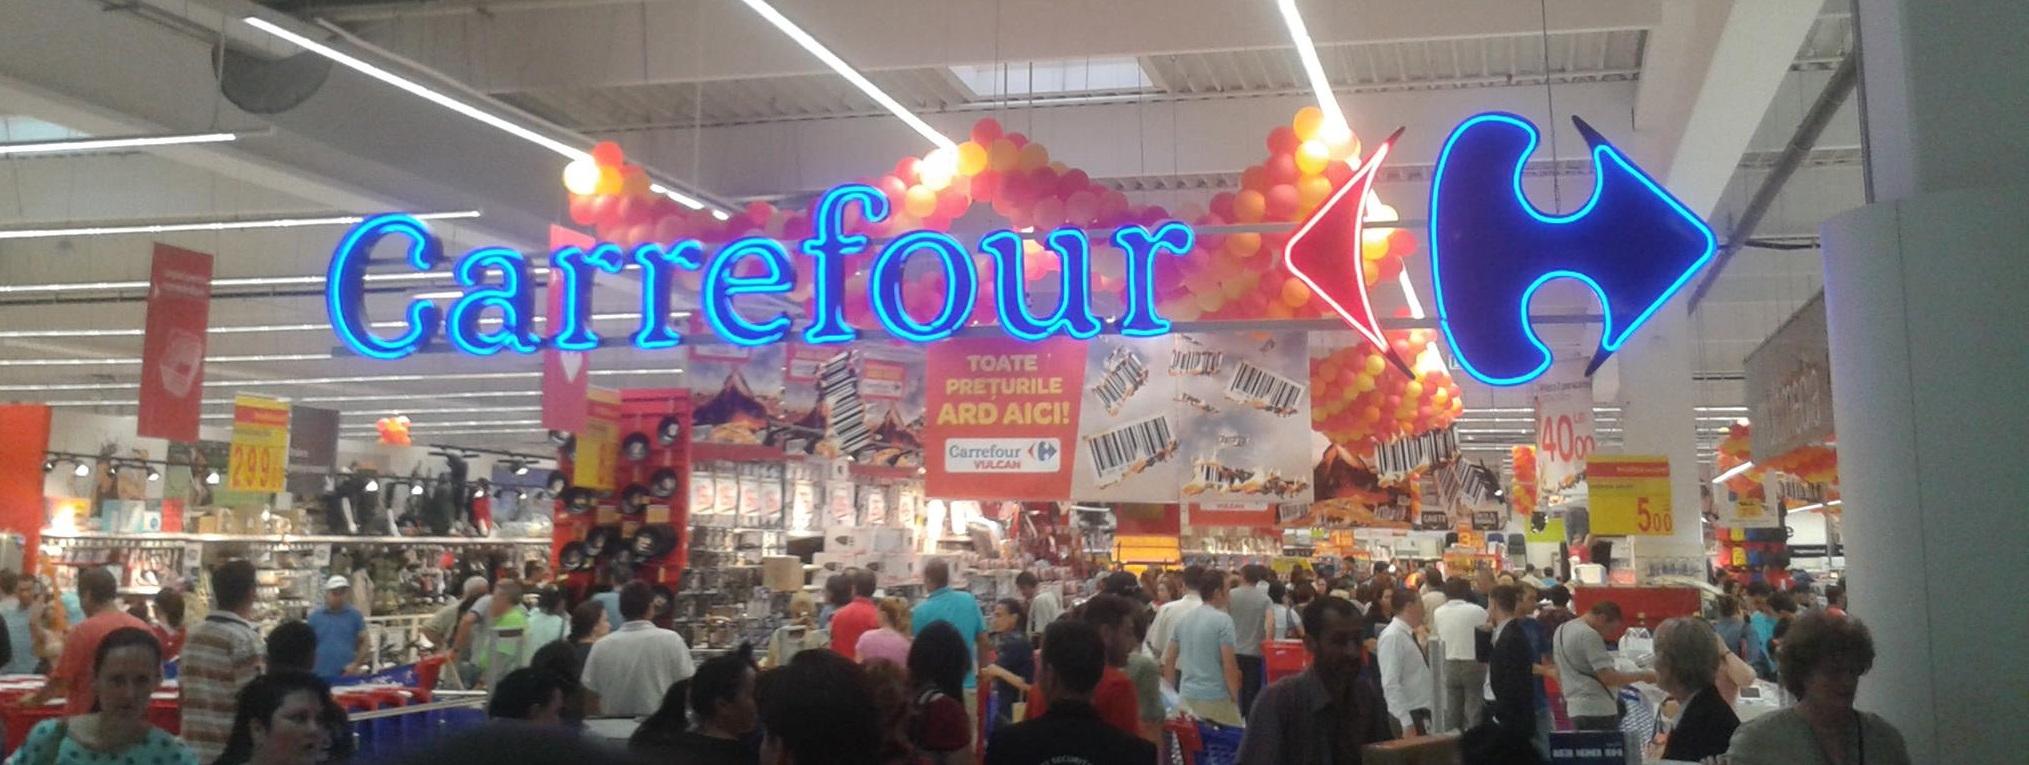 Carrefour Romania isi aduce director din Franta